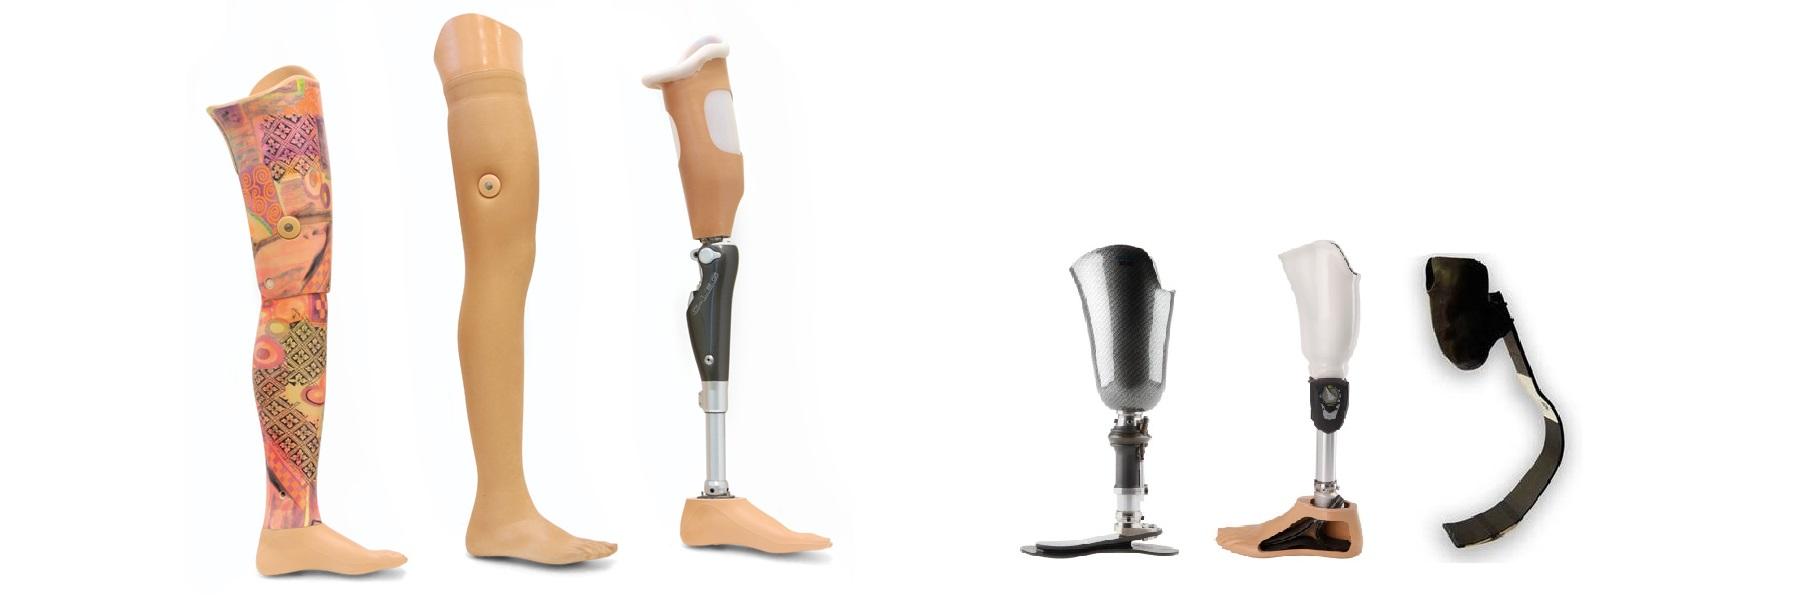 protesi_arti_inferiori_7_1.jpg